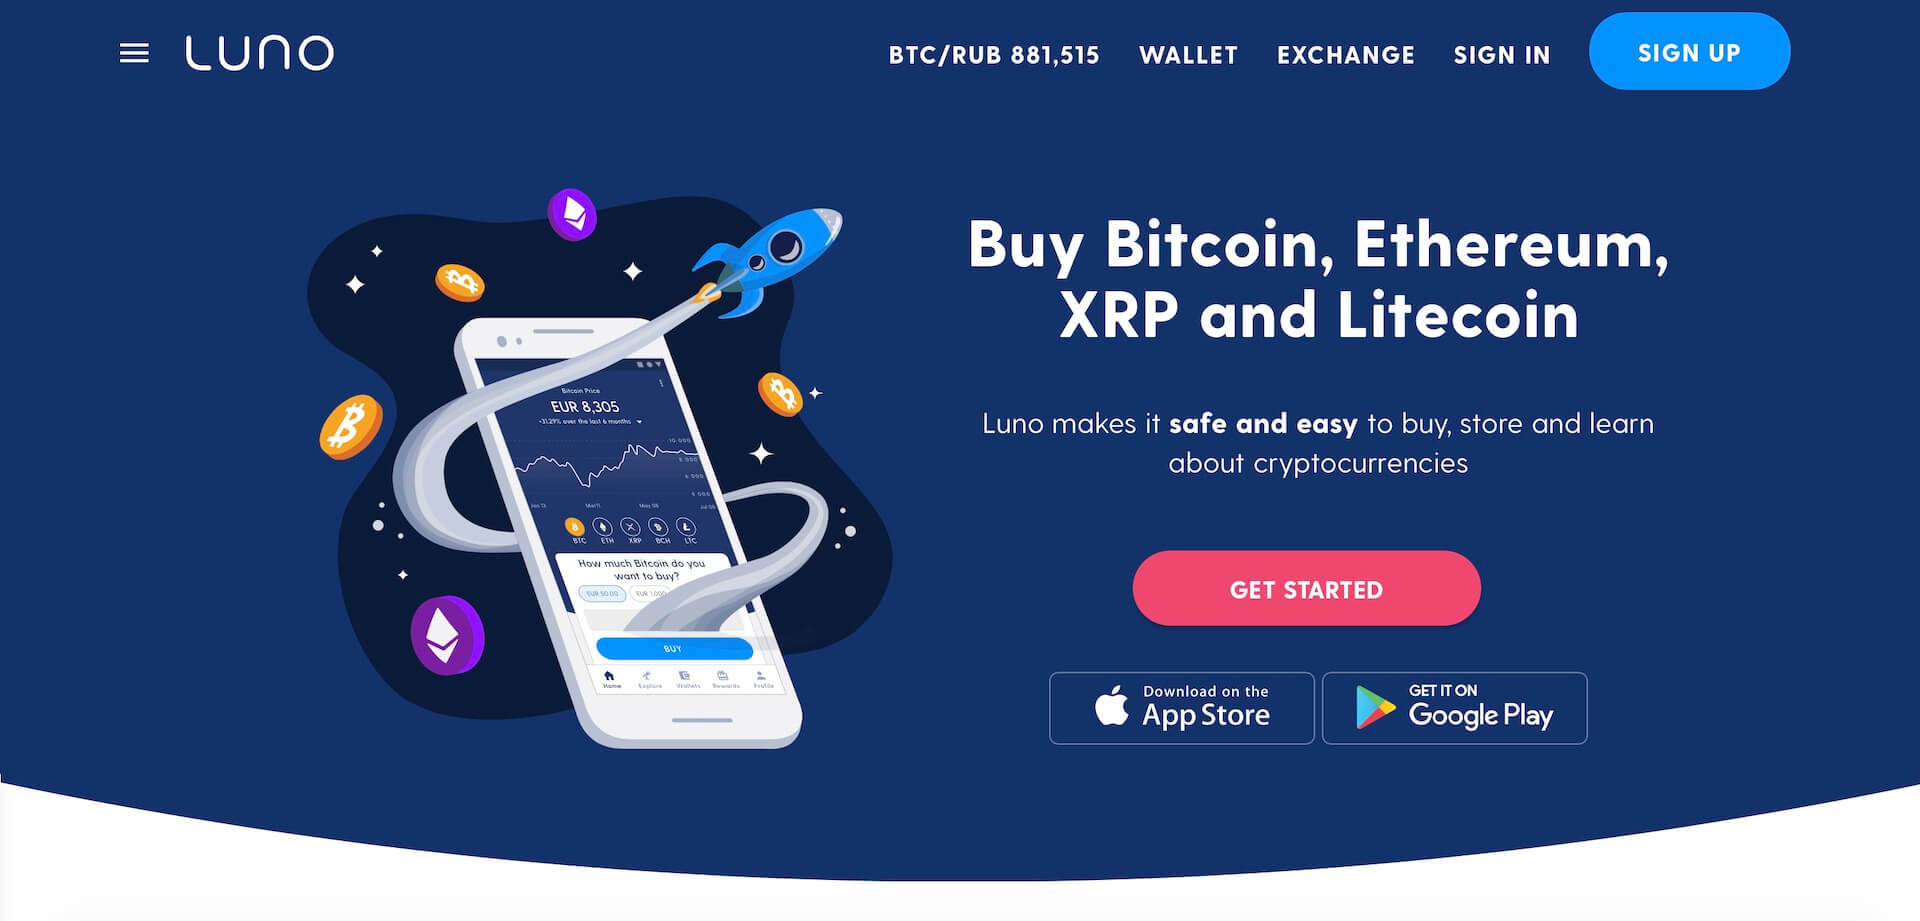 биржа криптовалют Luno